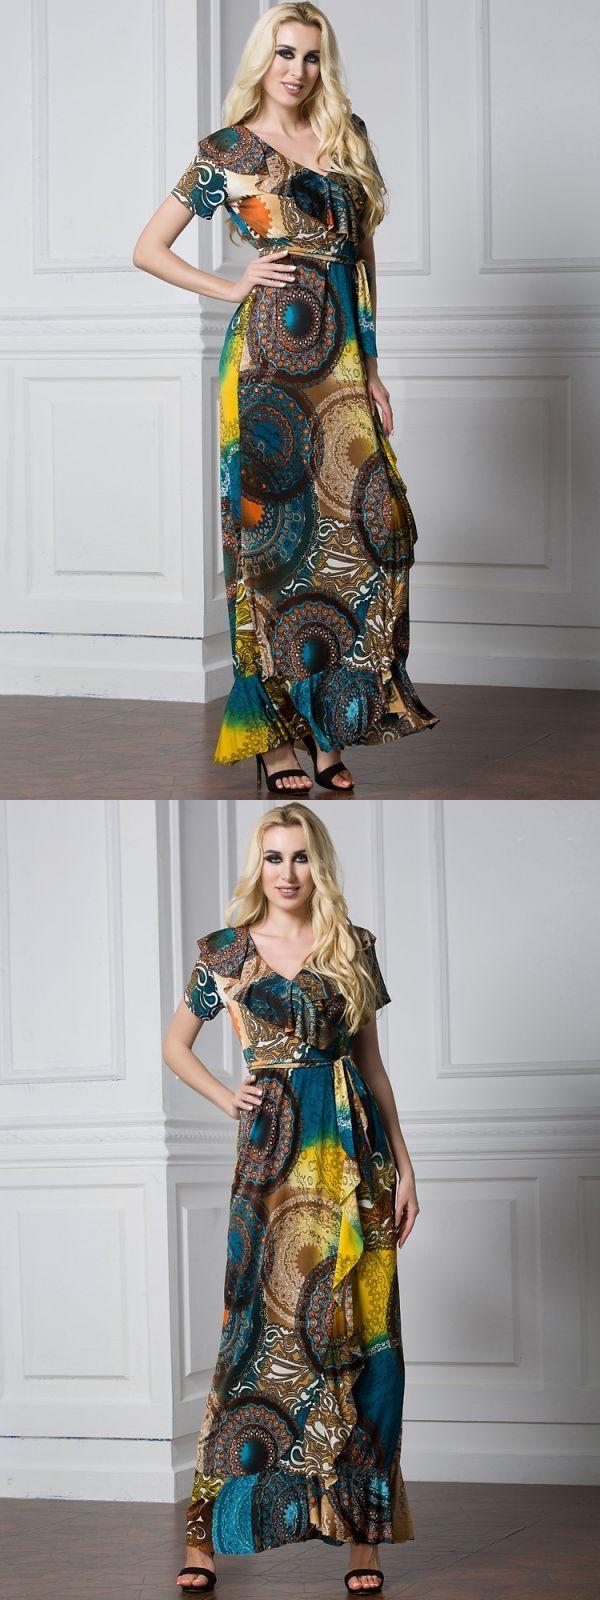 Maxi dresses in winter bohemian women ruffle v-neck printing short sleeve beach party maxi dress #famp;f #maxi #dresses #maxi #dresses #5 #pounds #maxi #dresses #kohls #juniors #maxi #dresses #too #long